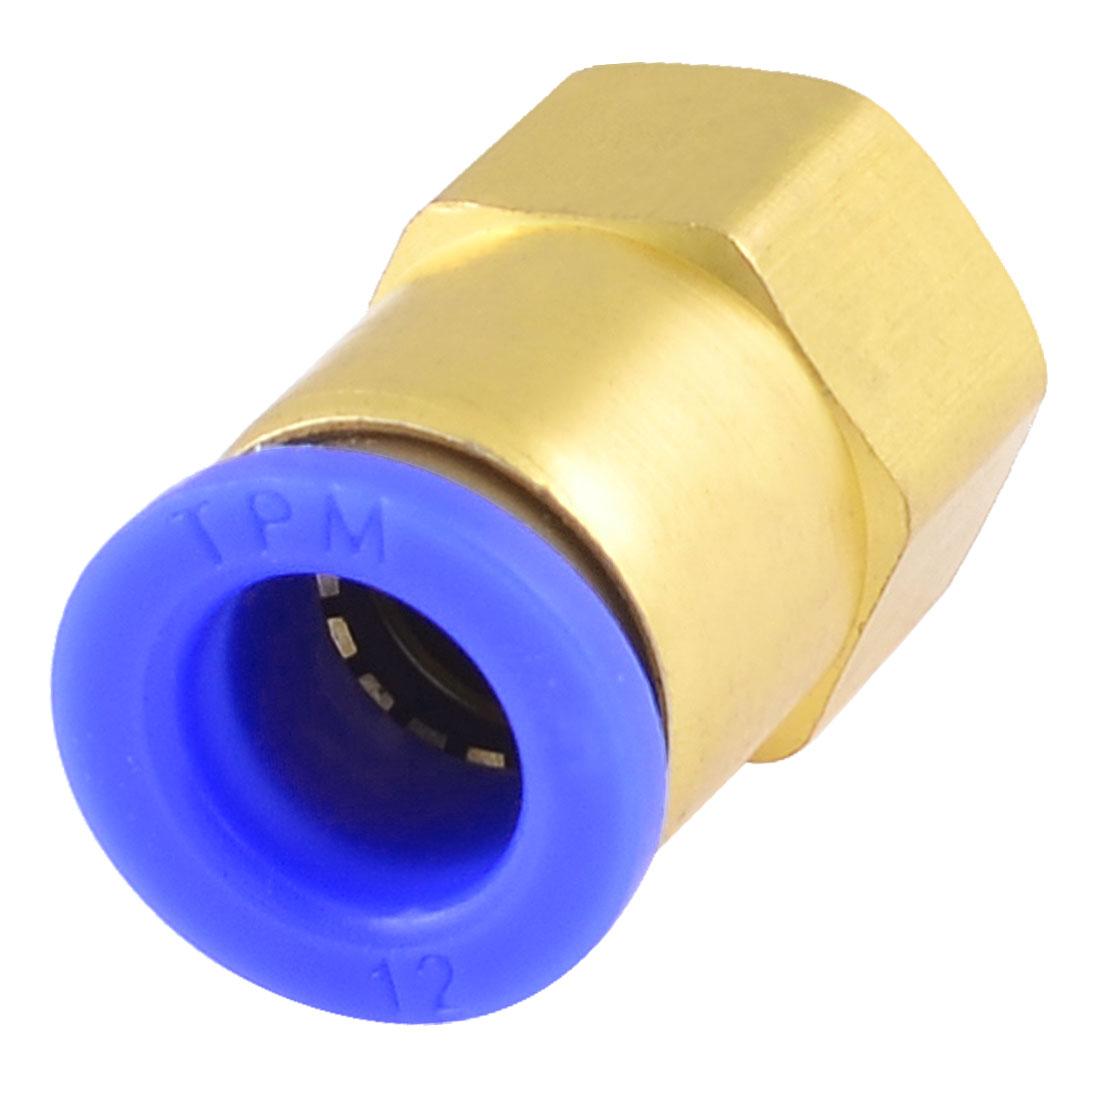 "Unique Bargains Unique Bargains Industry 1/4"" PT Female Thread Quick Coupler Connector for 12mm Inner Dia Tube - image 1 of 1"